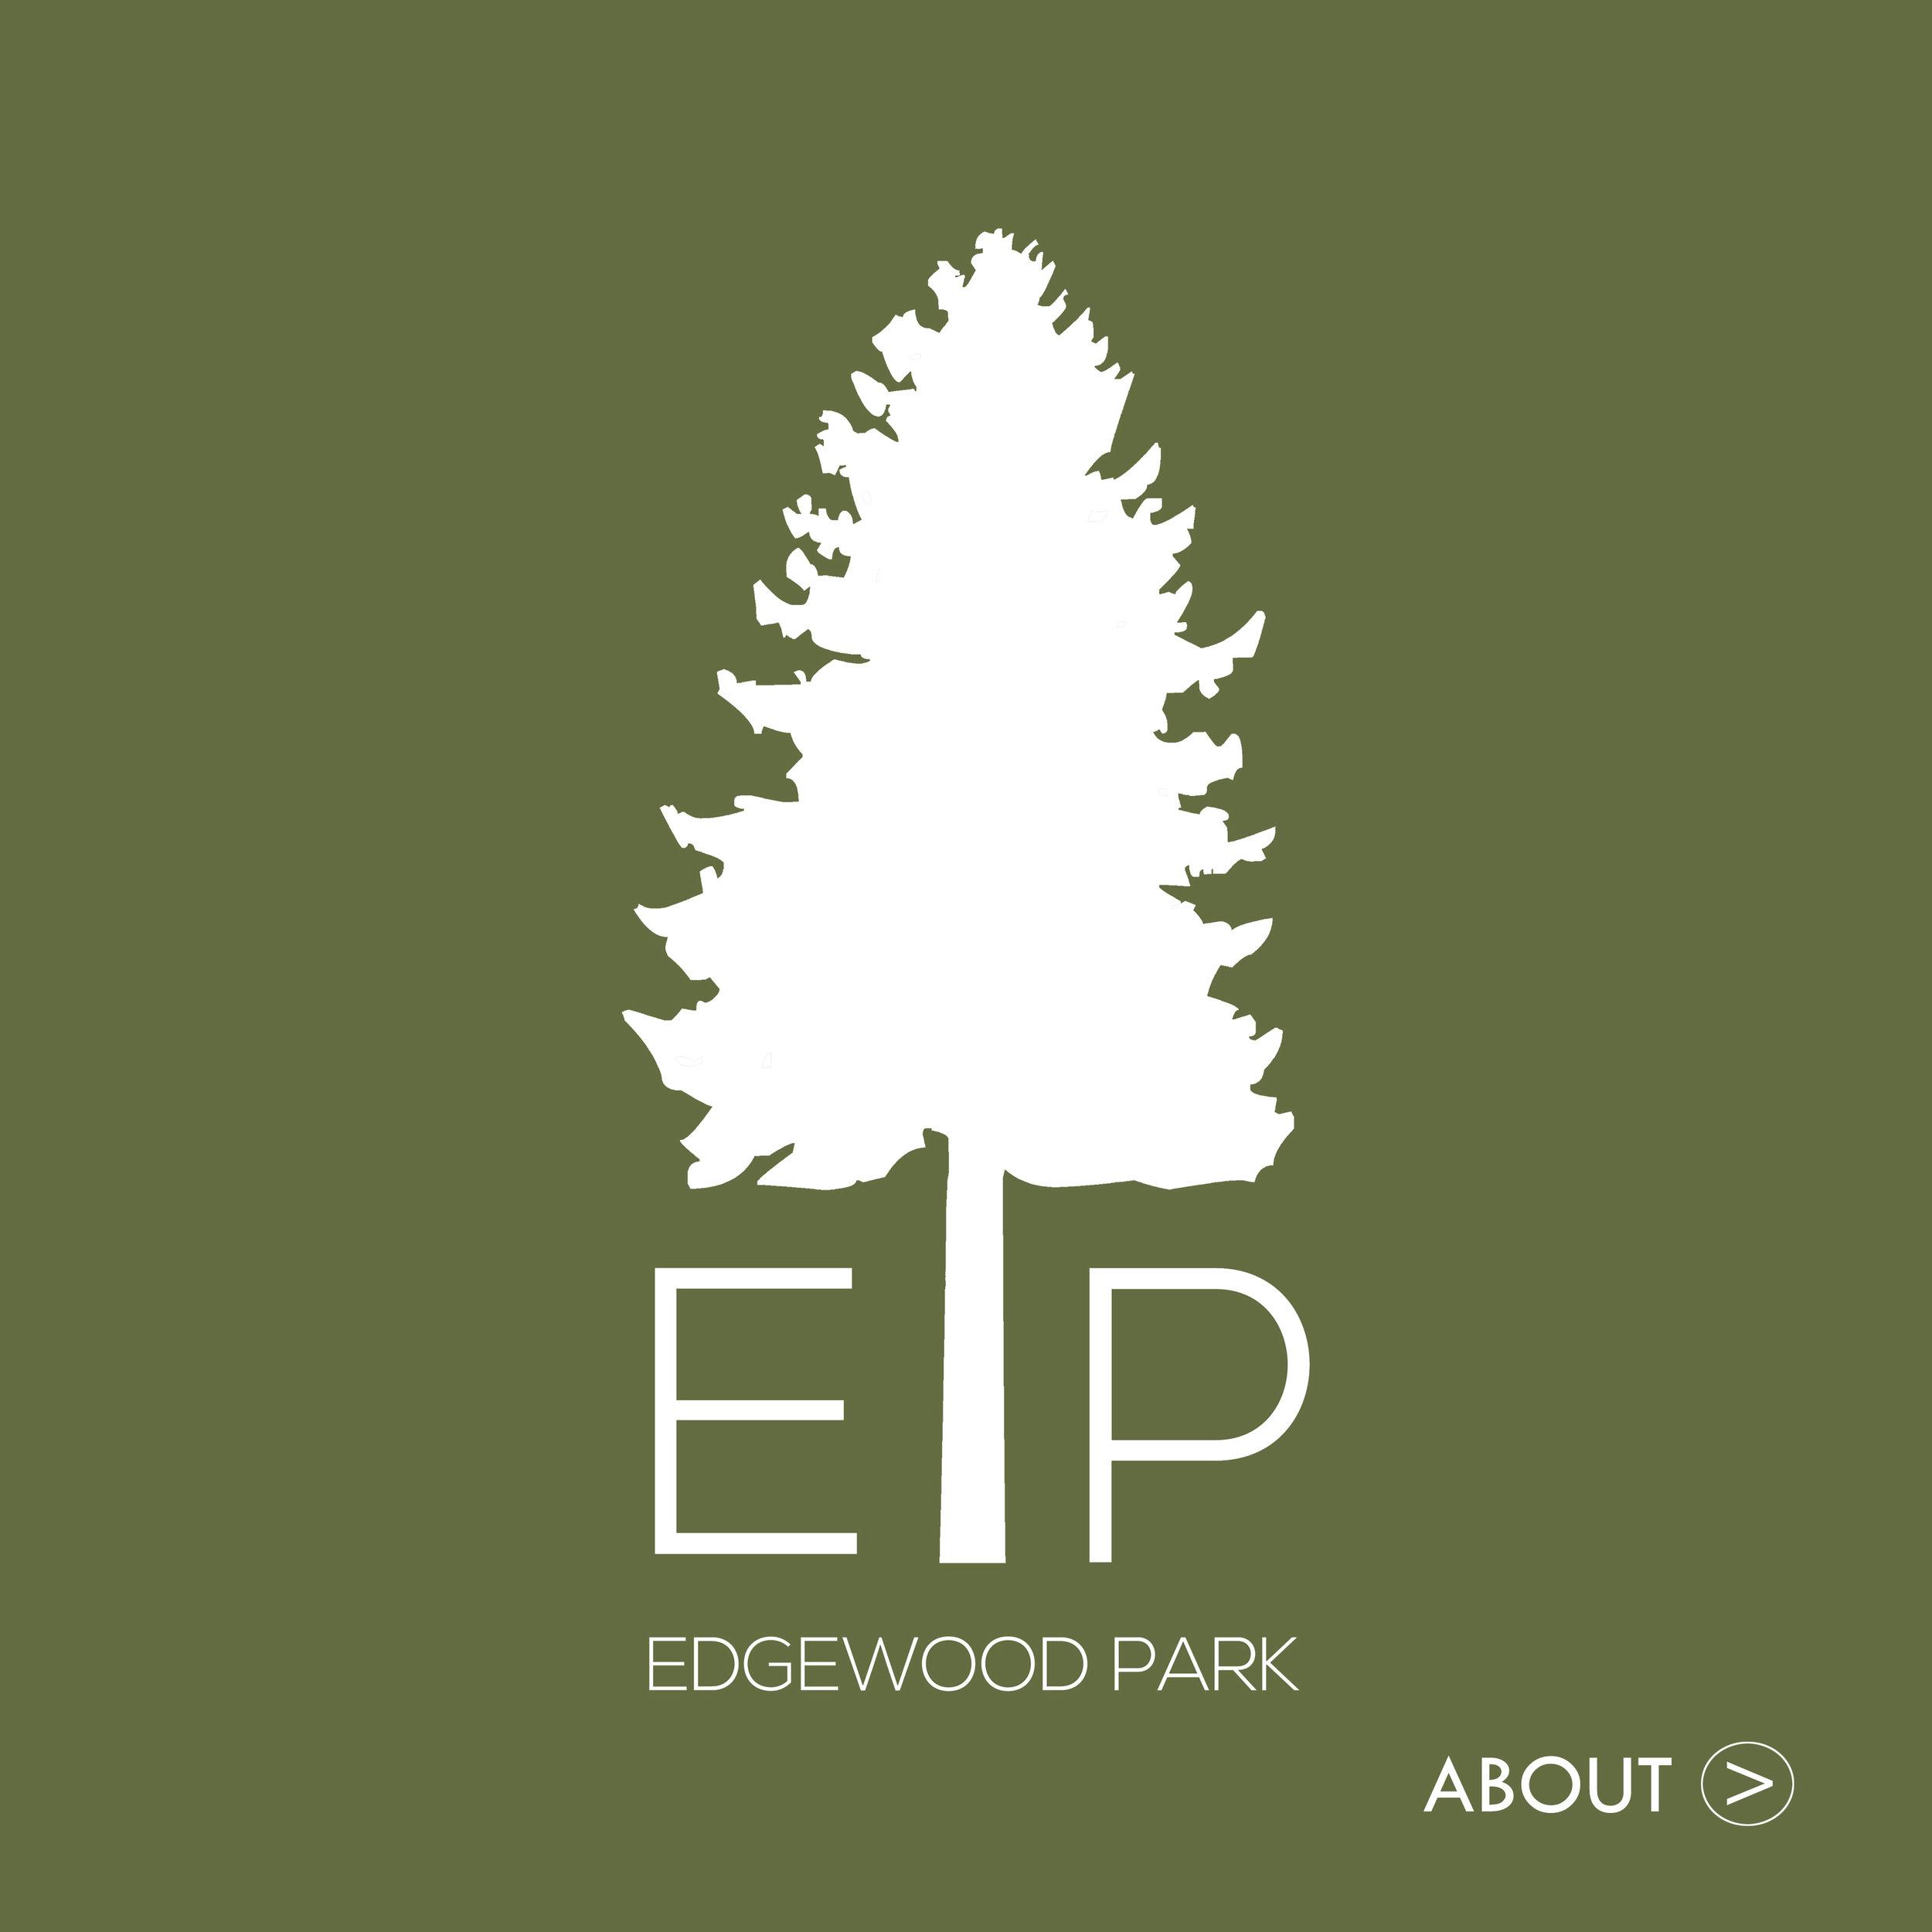 EdgewoodPark